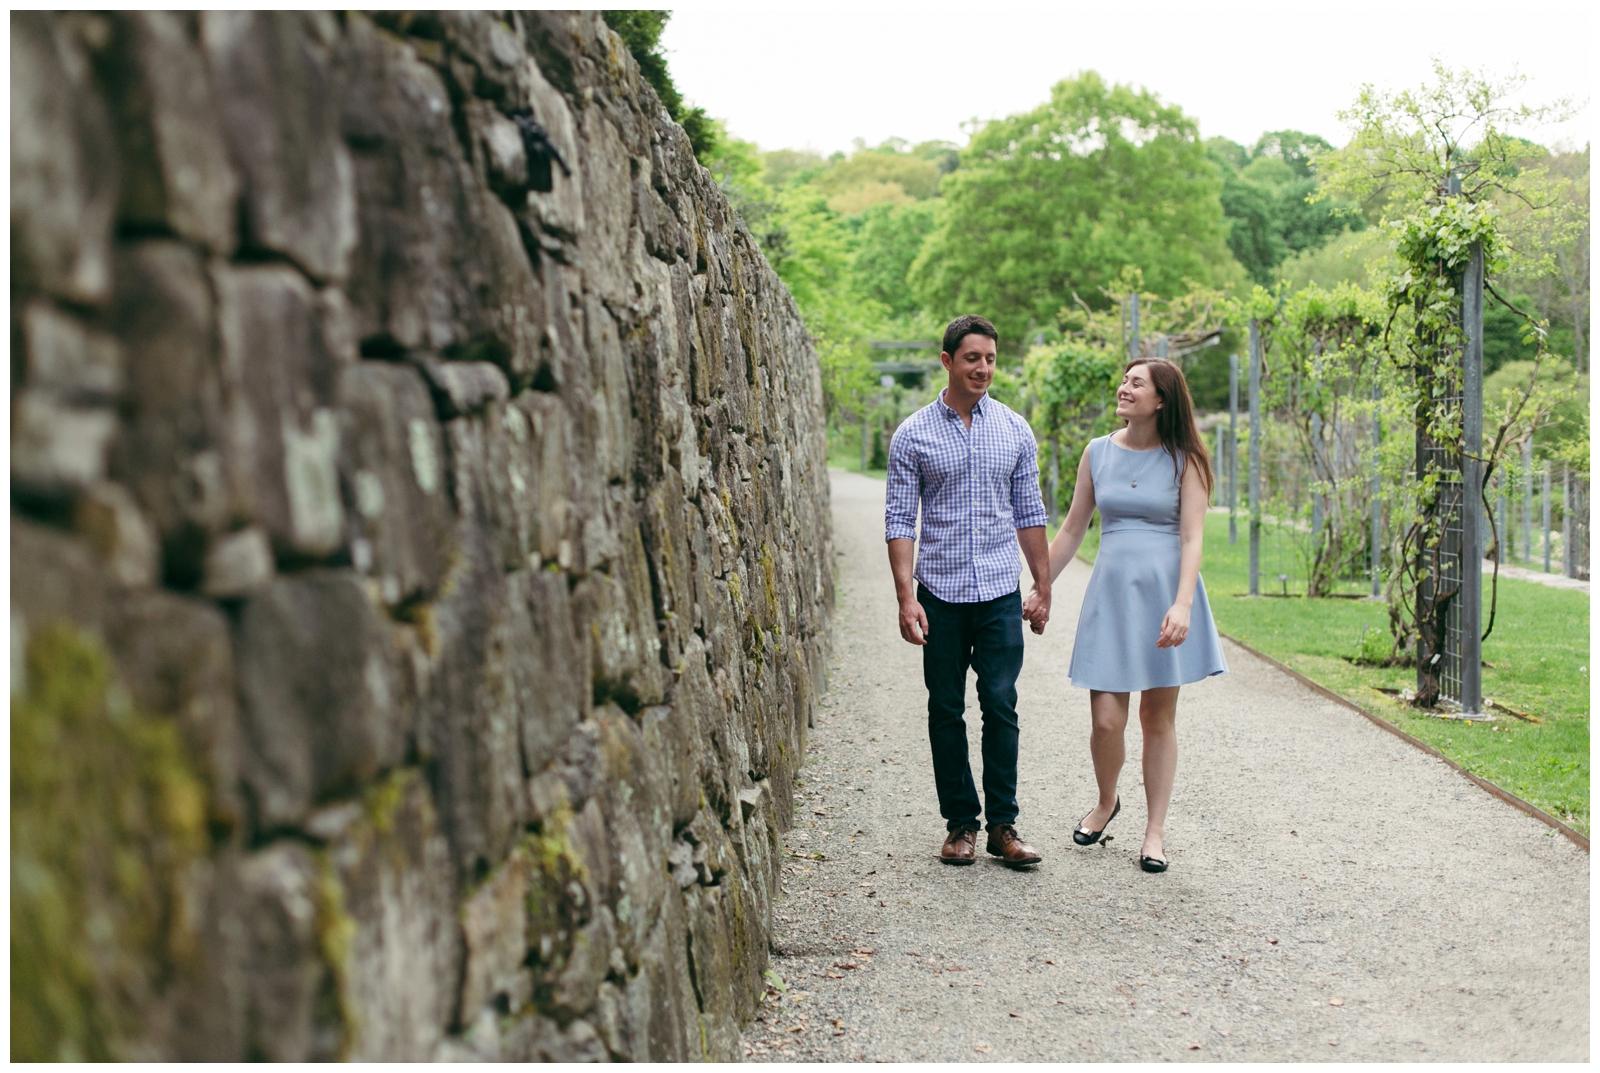 Arnold-Arboretum-Engagement-Boston-Wedding-Photographer-Bailey-Q-Photo-012.jpg